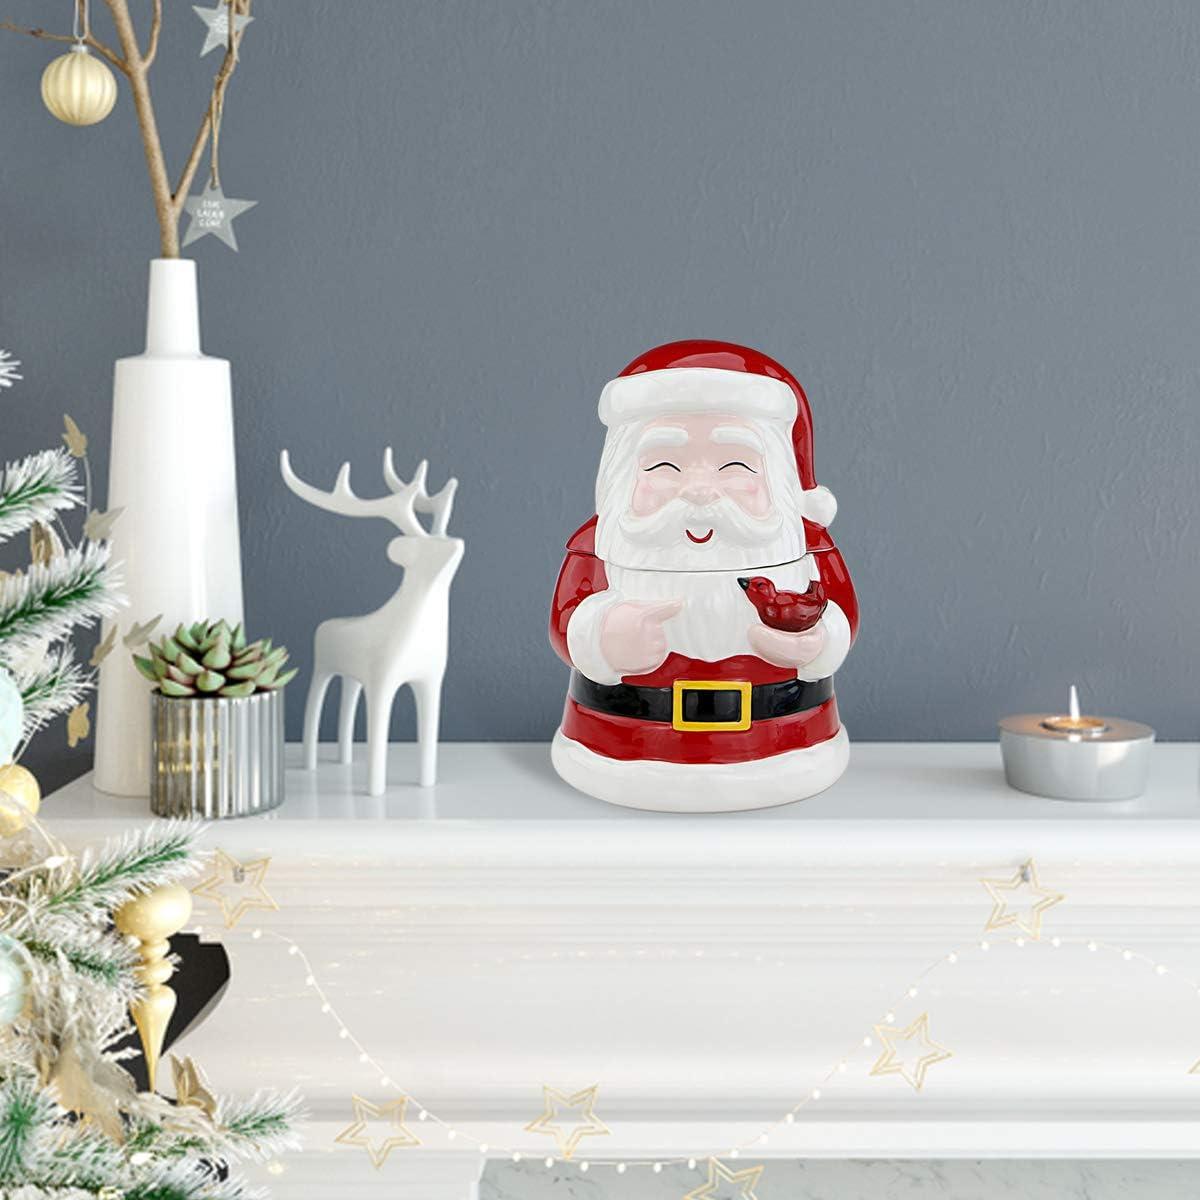 Smiling Festive Santa Claus Centerpieces Bedroom Living Room STAR MOON Christmas Santa Claus Ceramic Candy & Cookie Jar for Home Decor